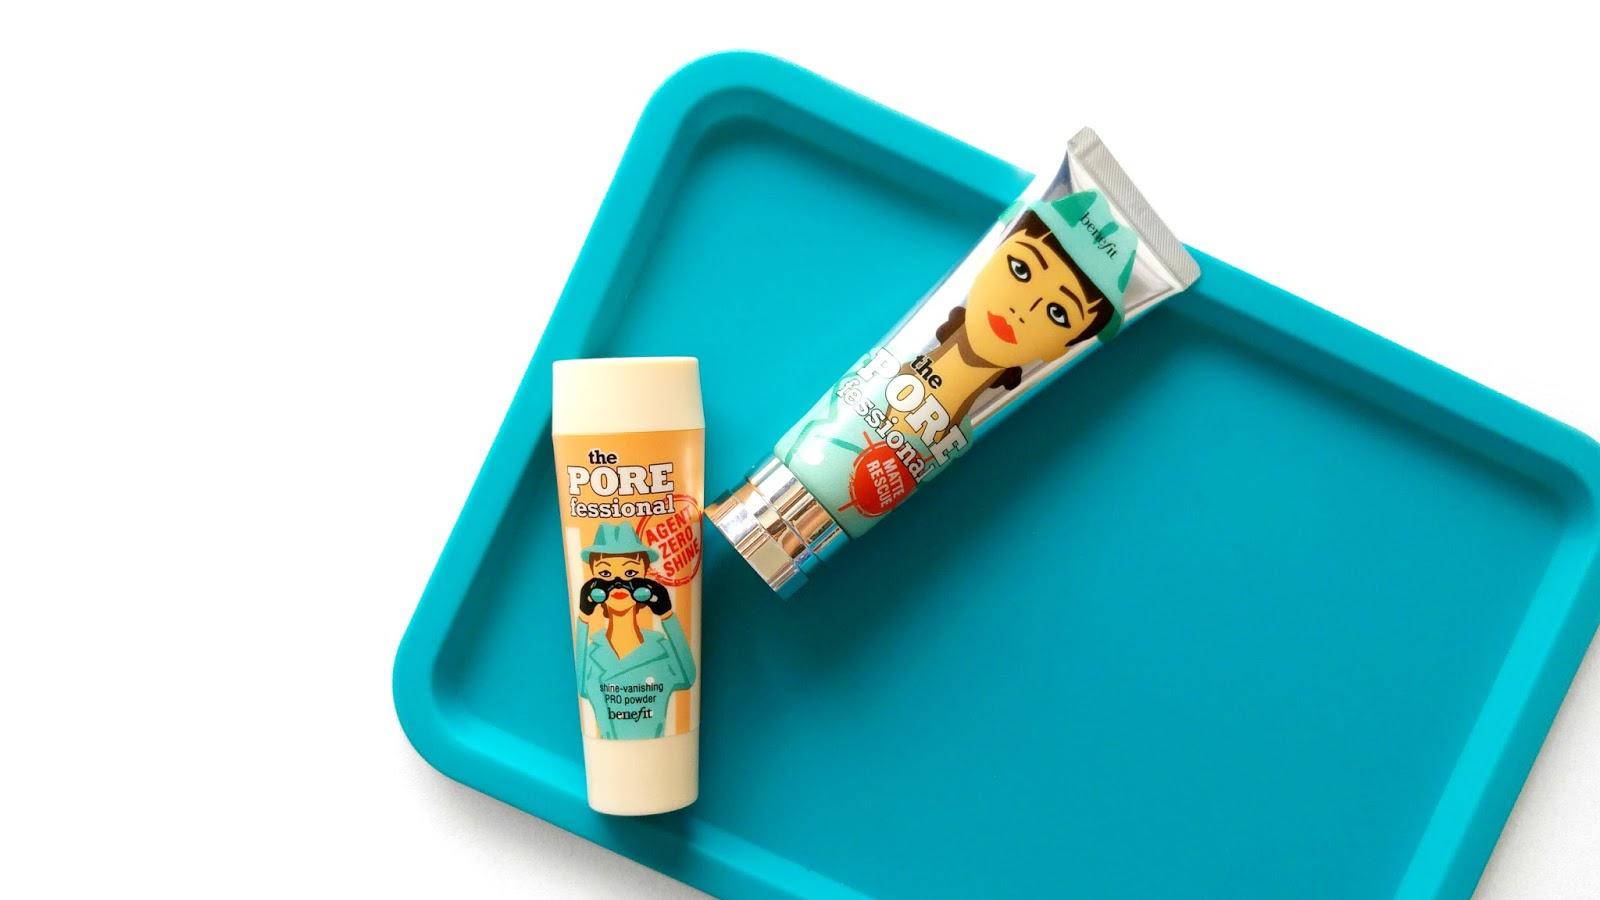 Benefit Cosmetics Oily Skin Killer Duo, Benefit Cosmetics Porefessional Matte Rescue, Benefit Cosmetics Agent Zero Shine Powder